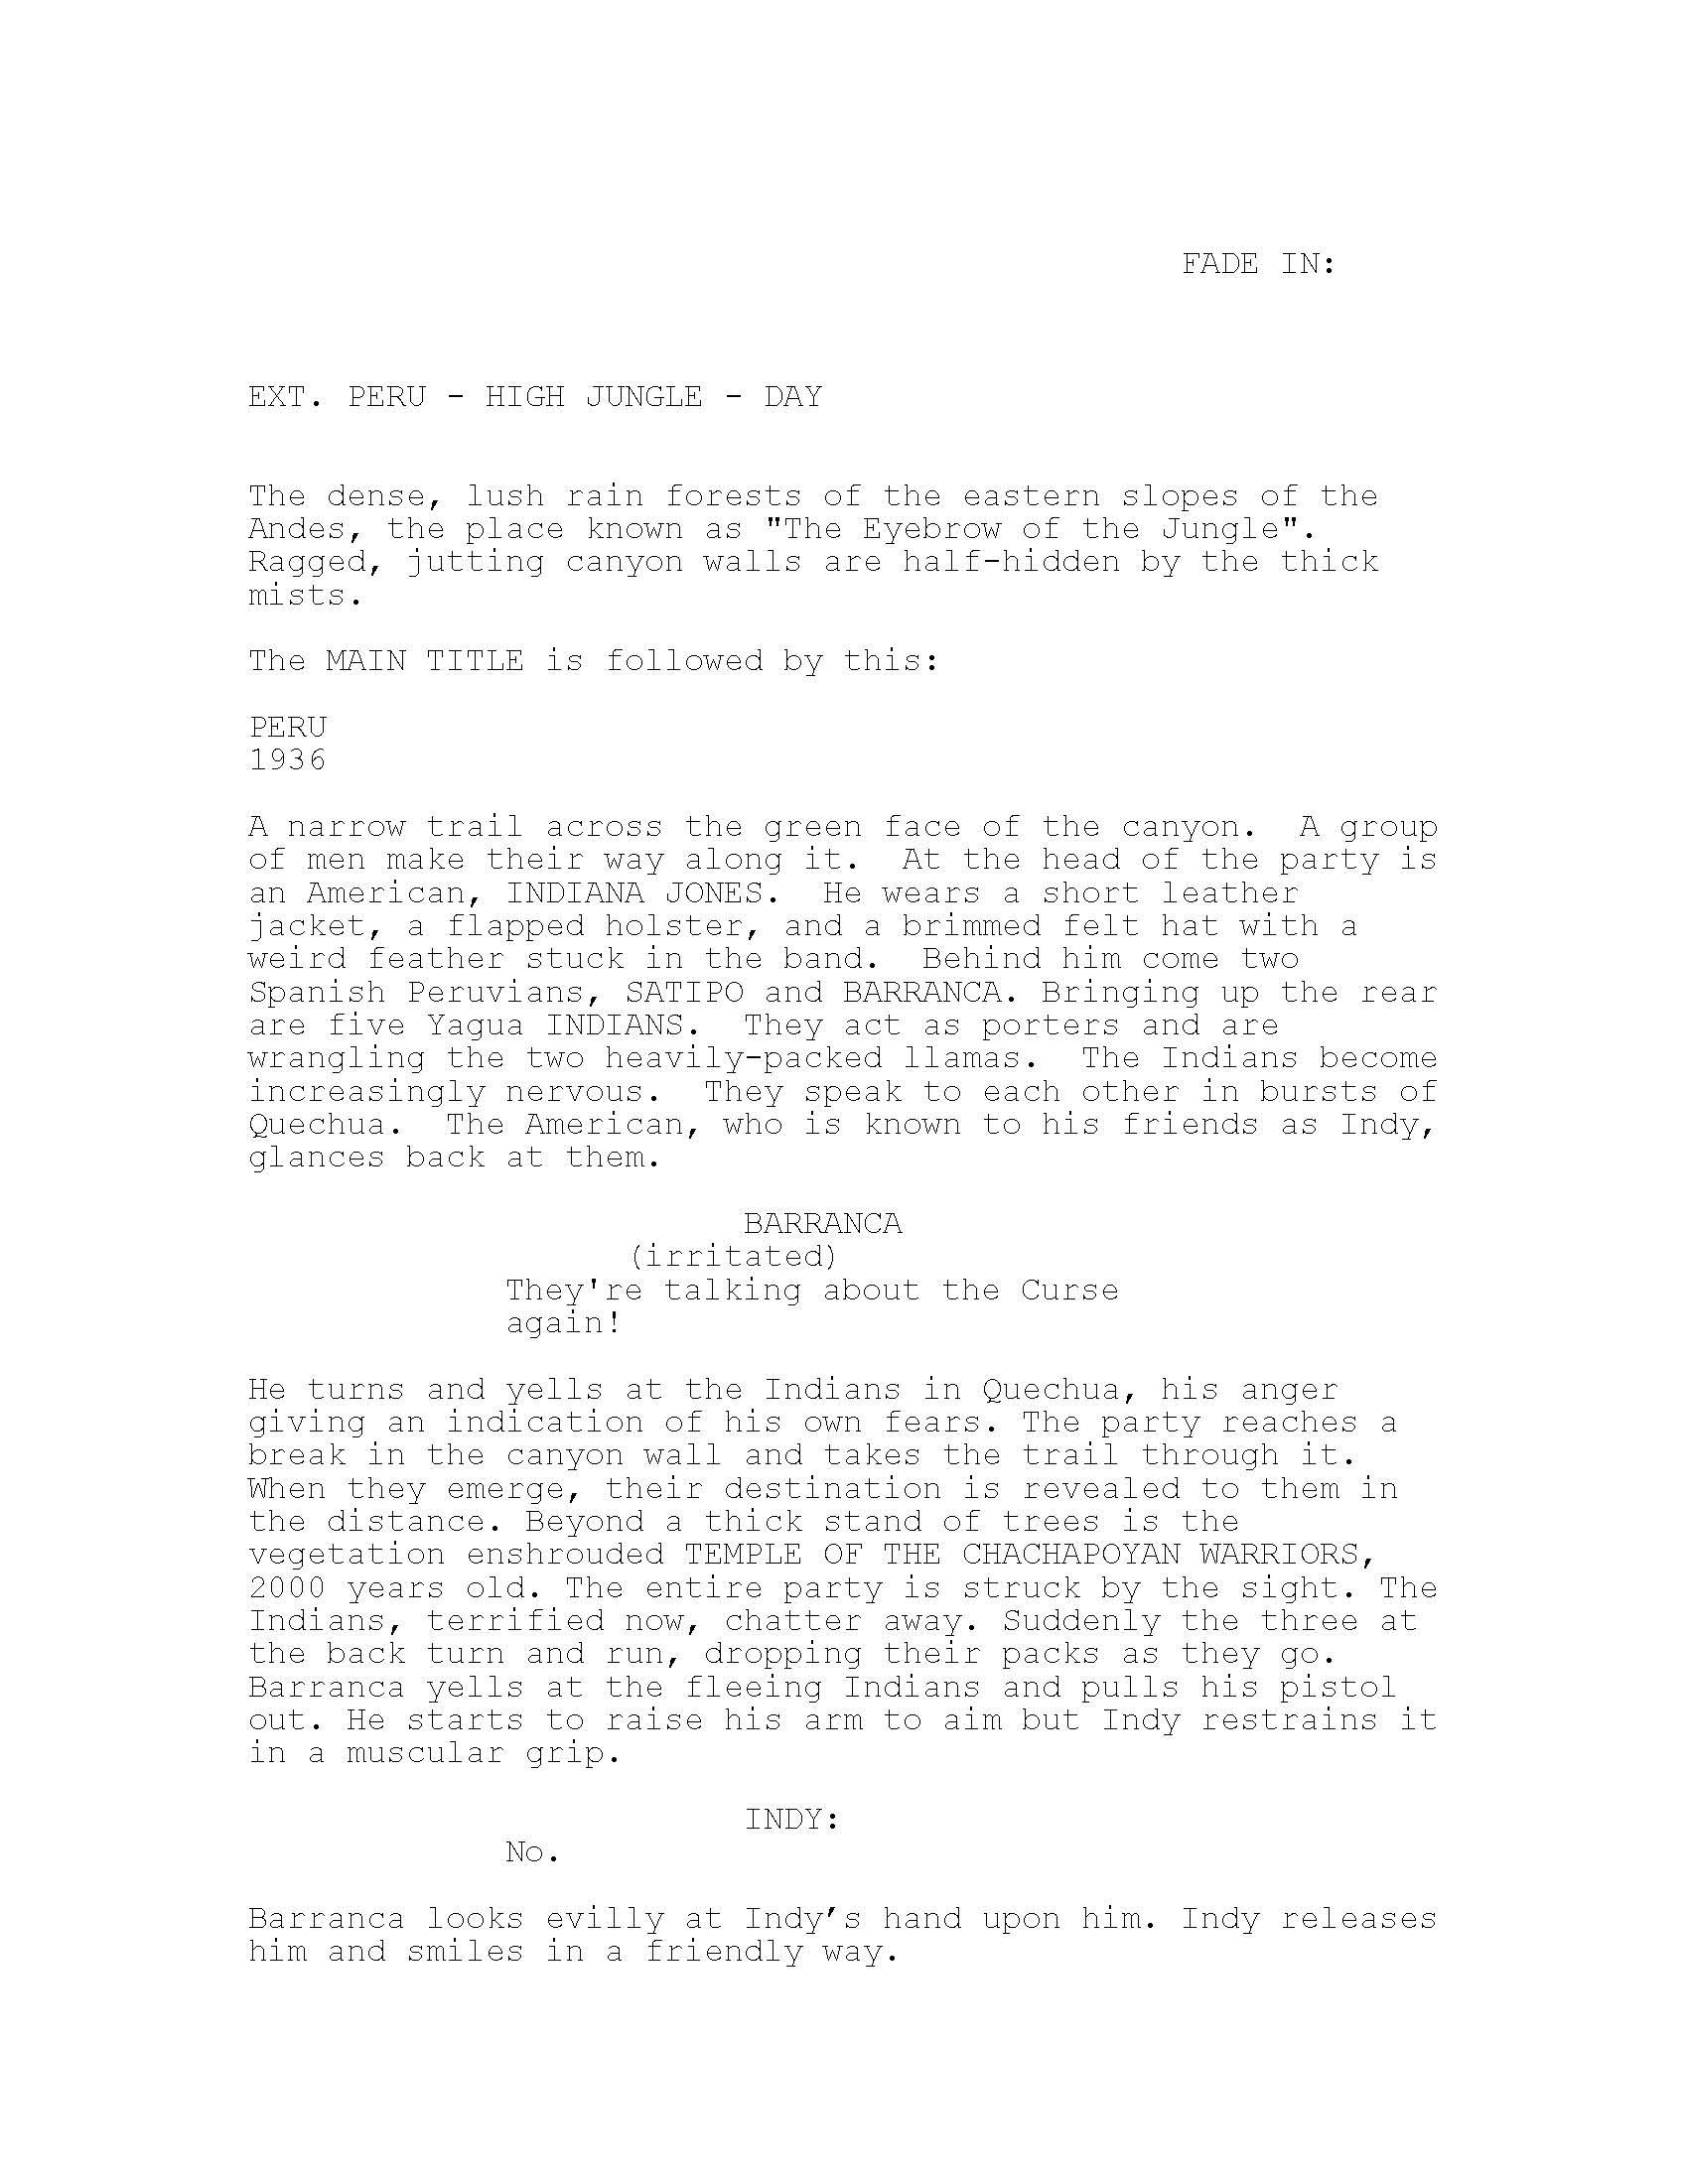 raiders-page1.jpg